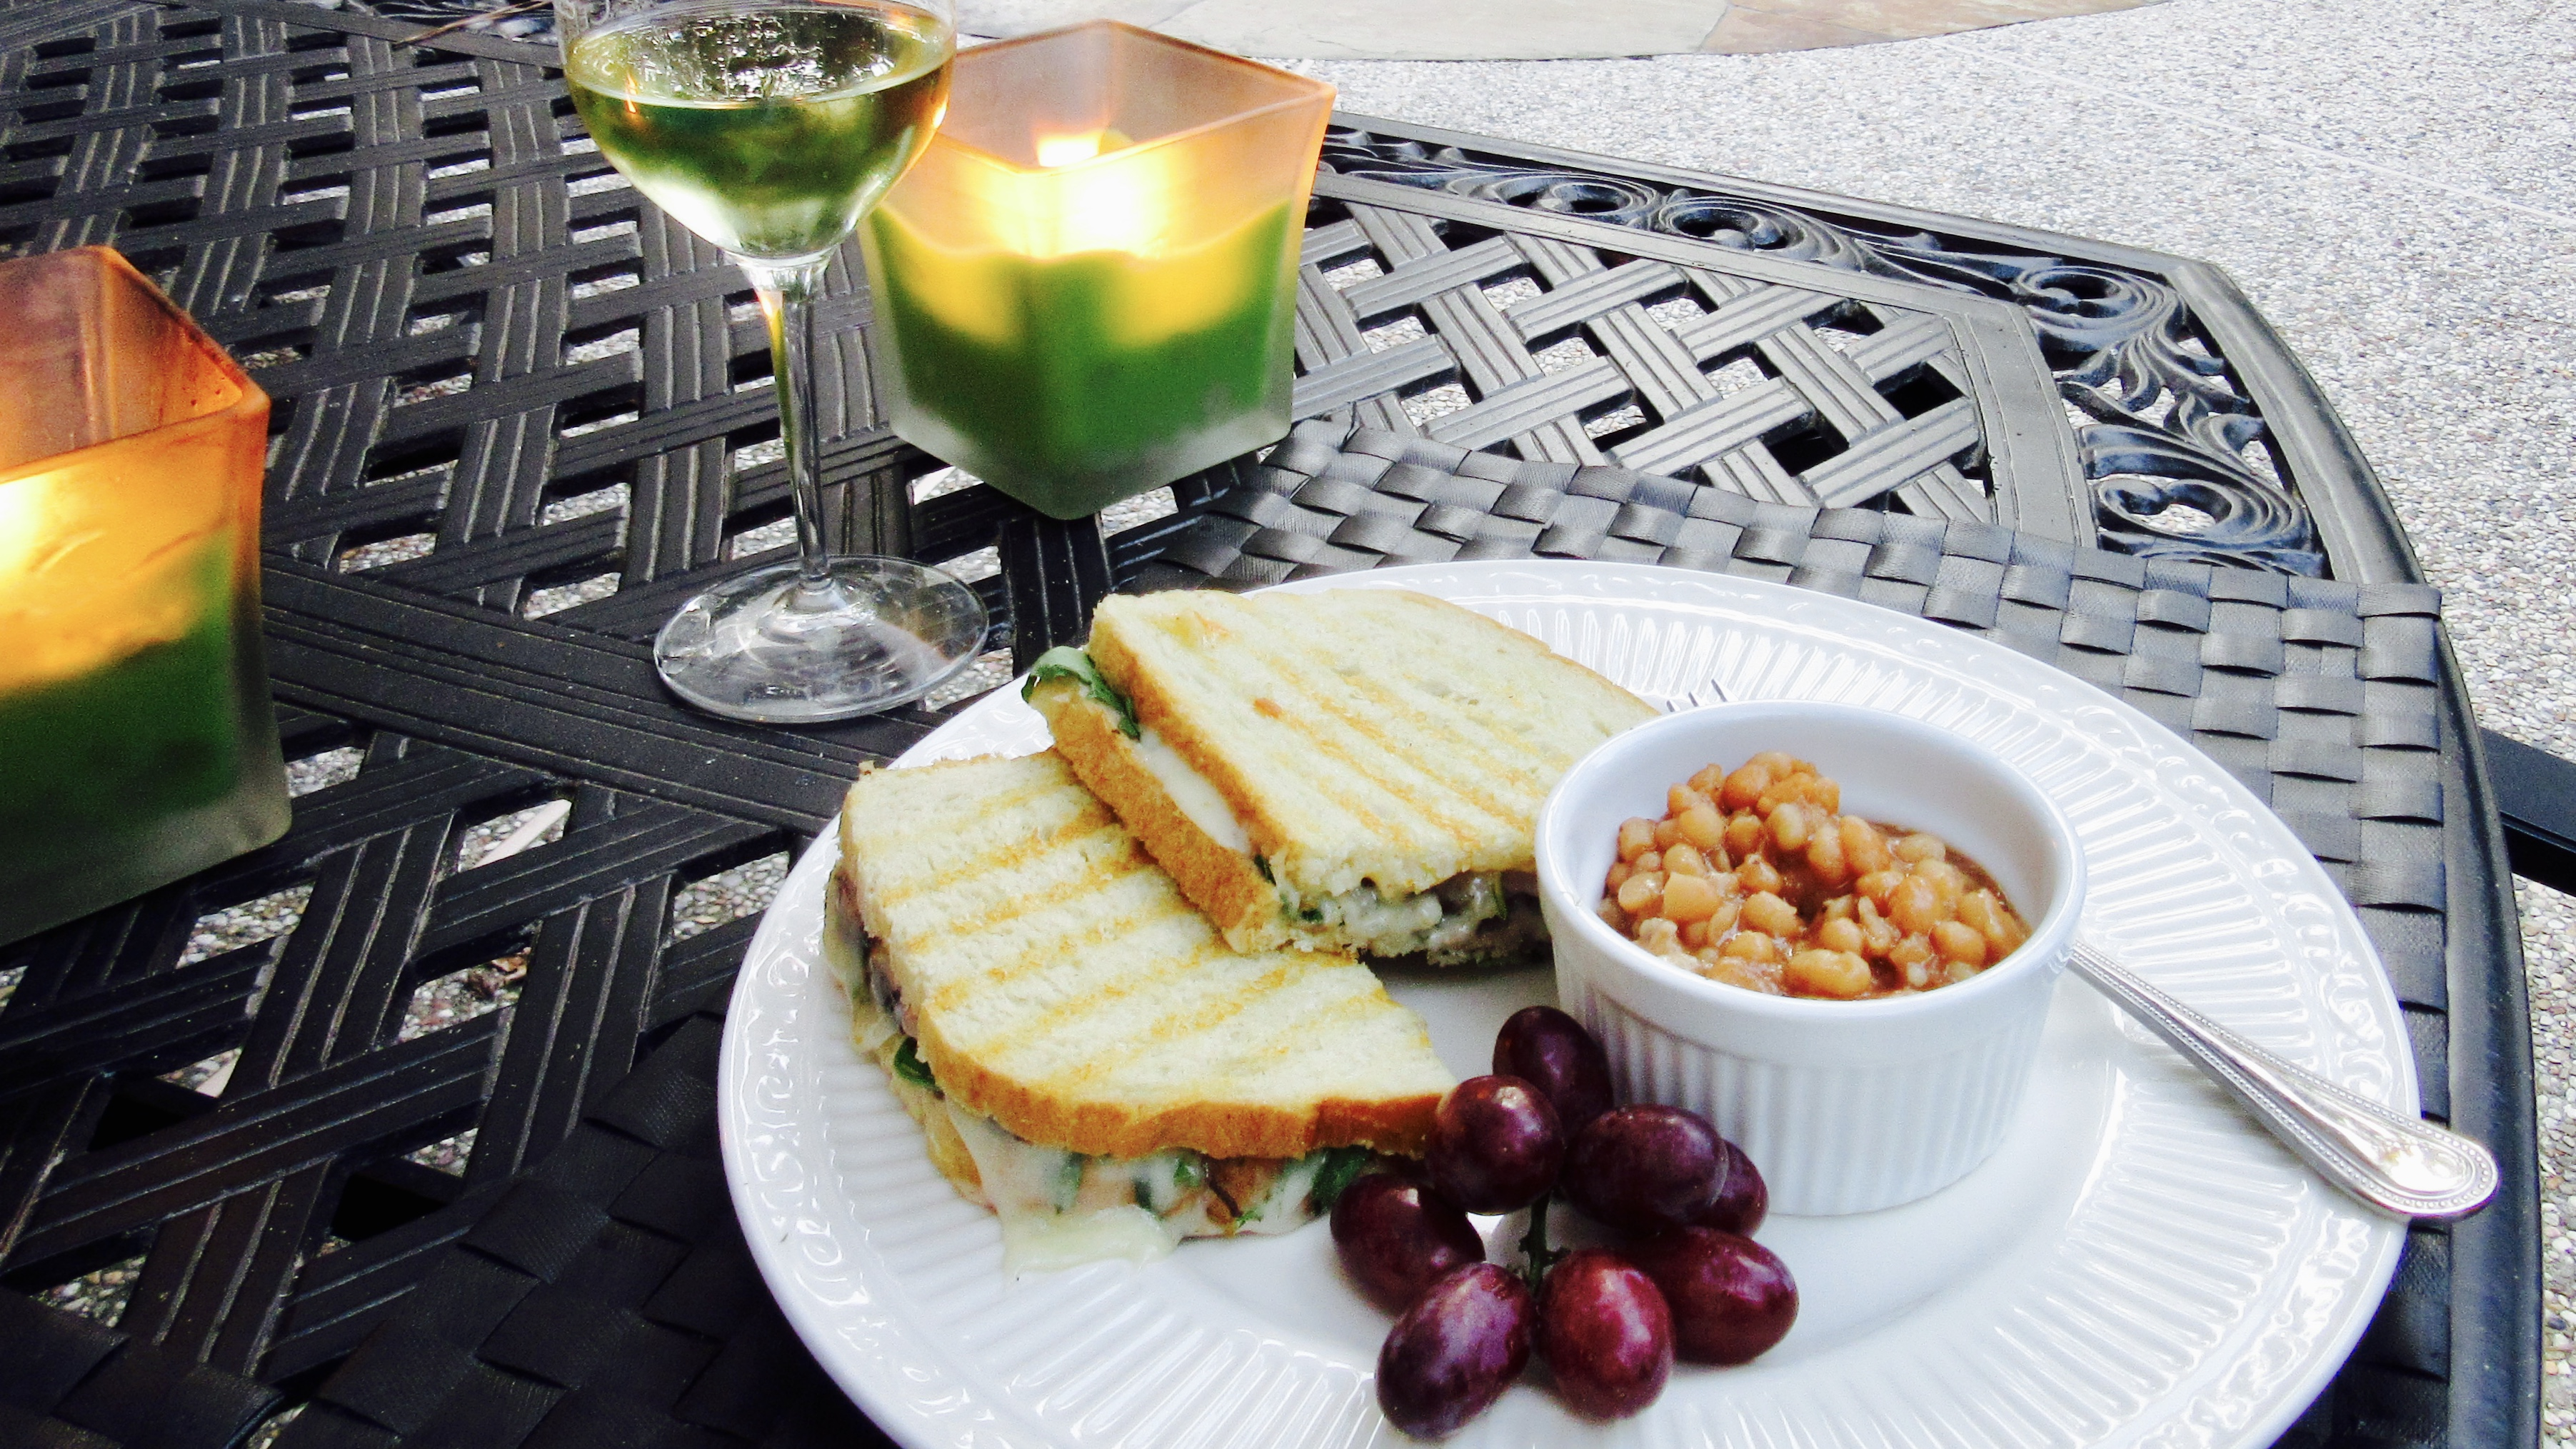 Sandwich Wednesday: Steak and Fontina Panini